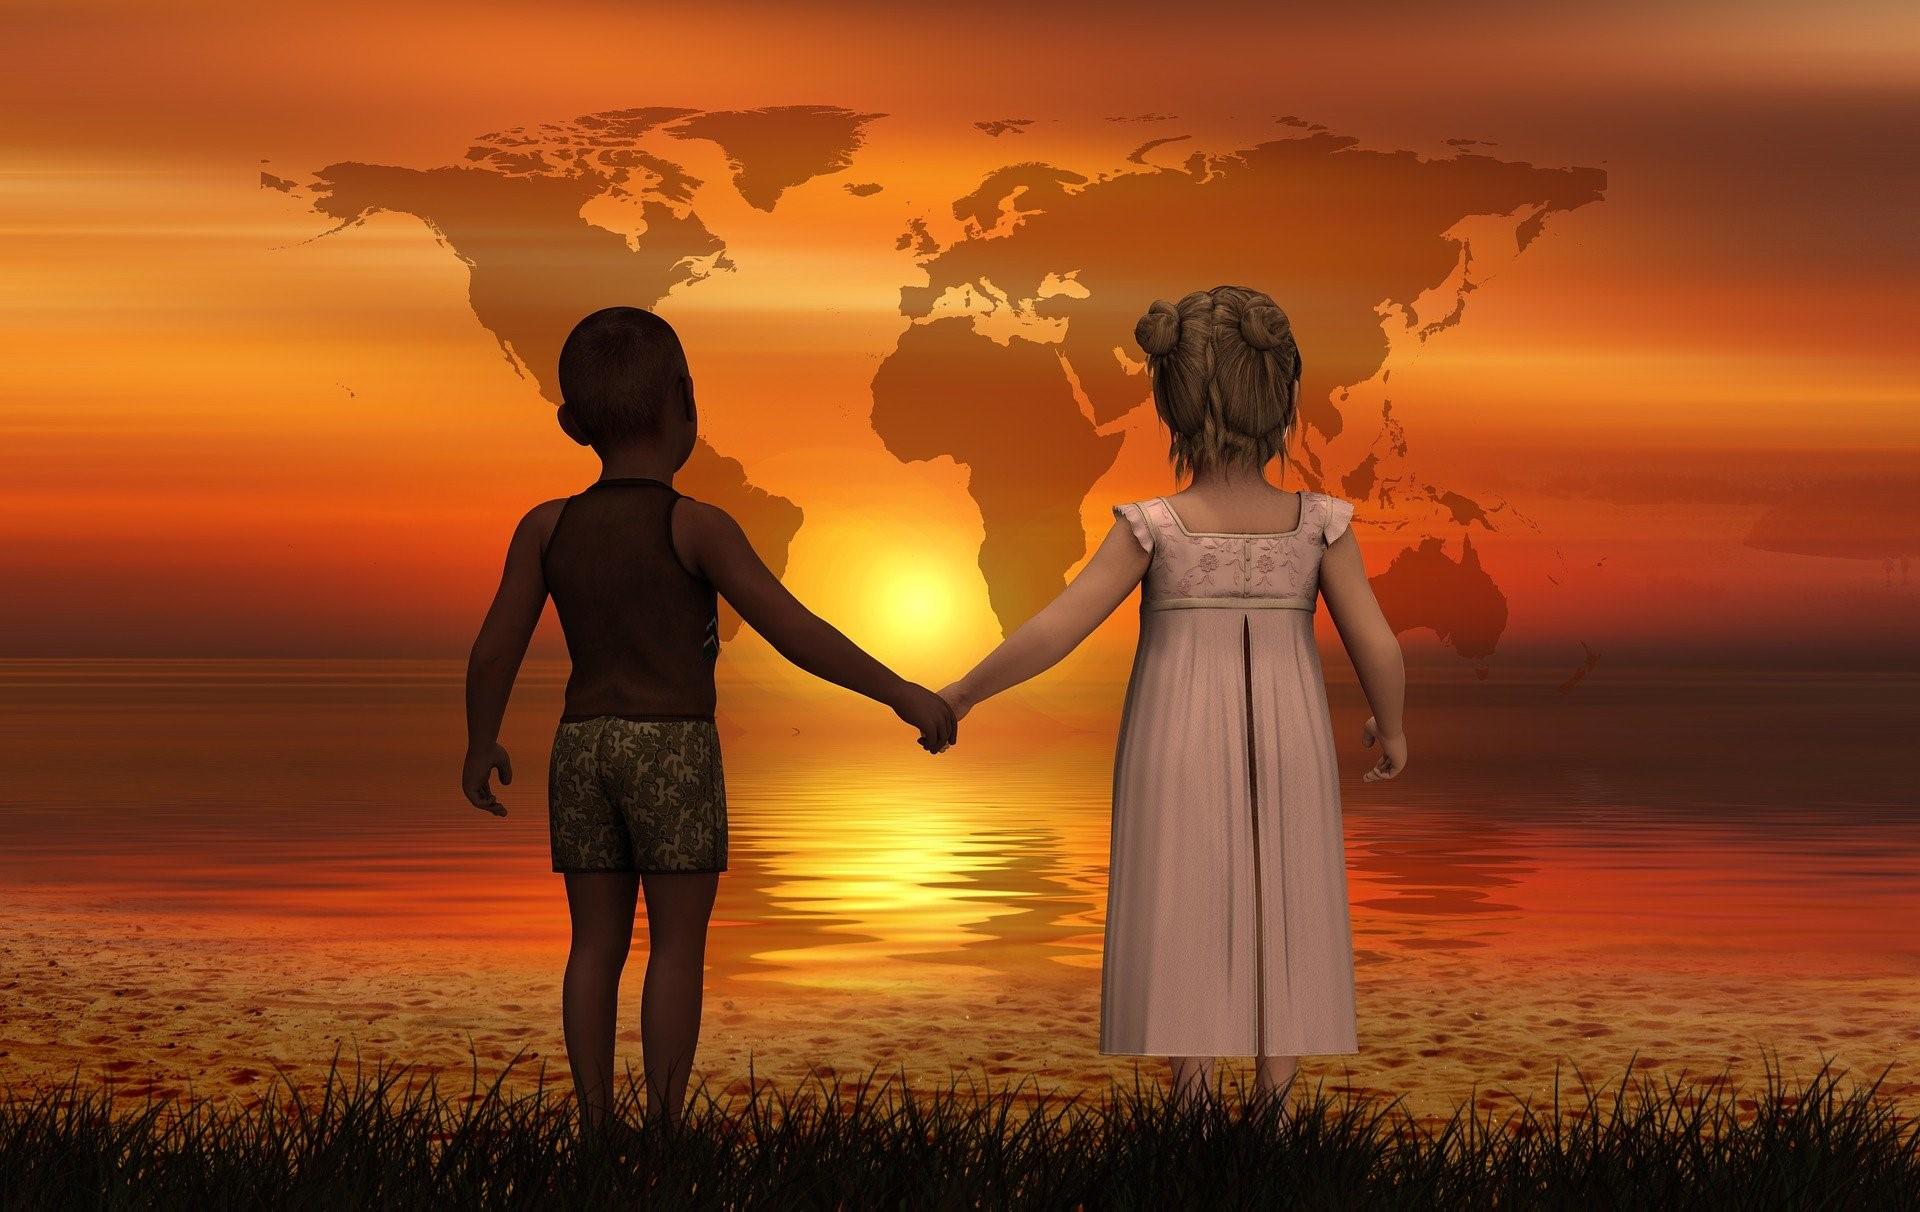 https://alessandriatoday.files.wordpress.com/2020/06/children-2857263_1920.jpg